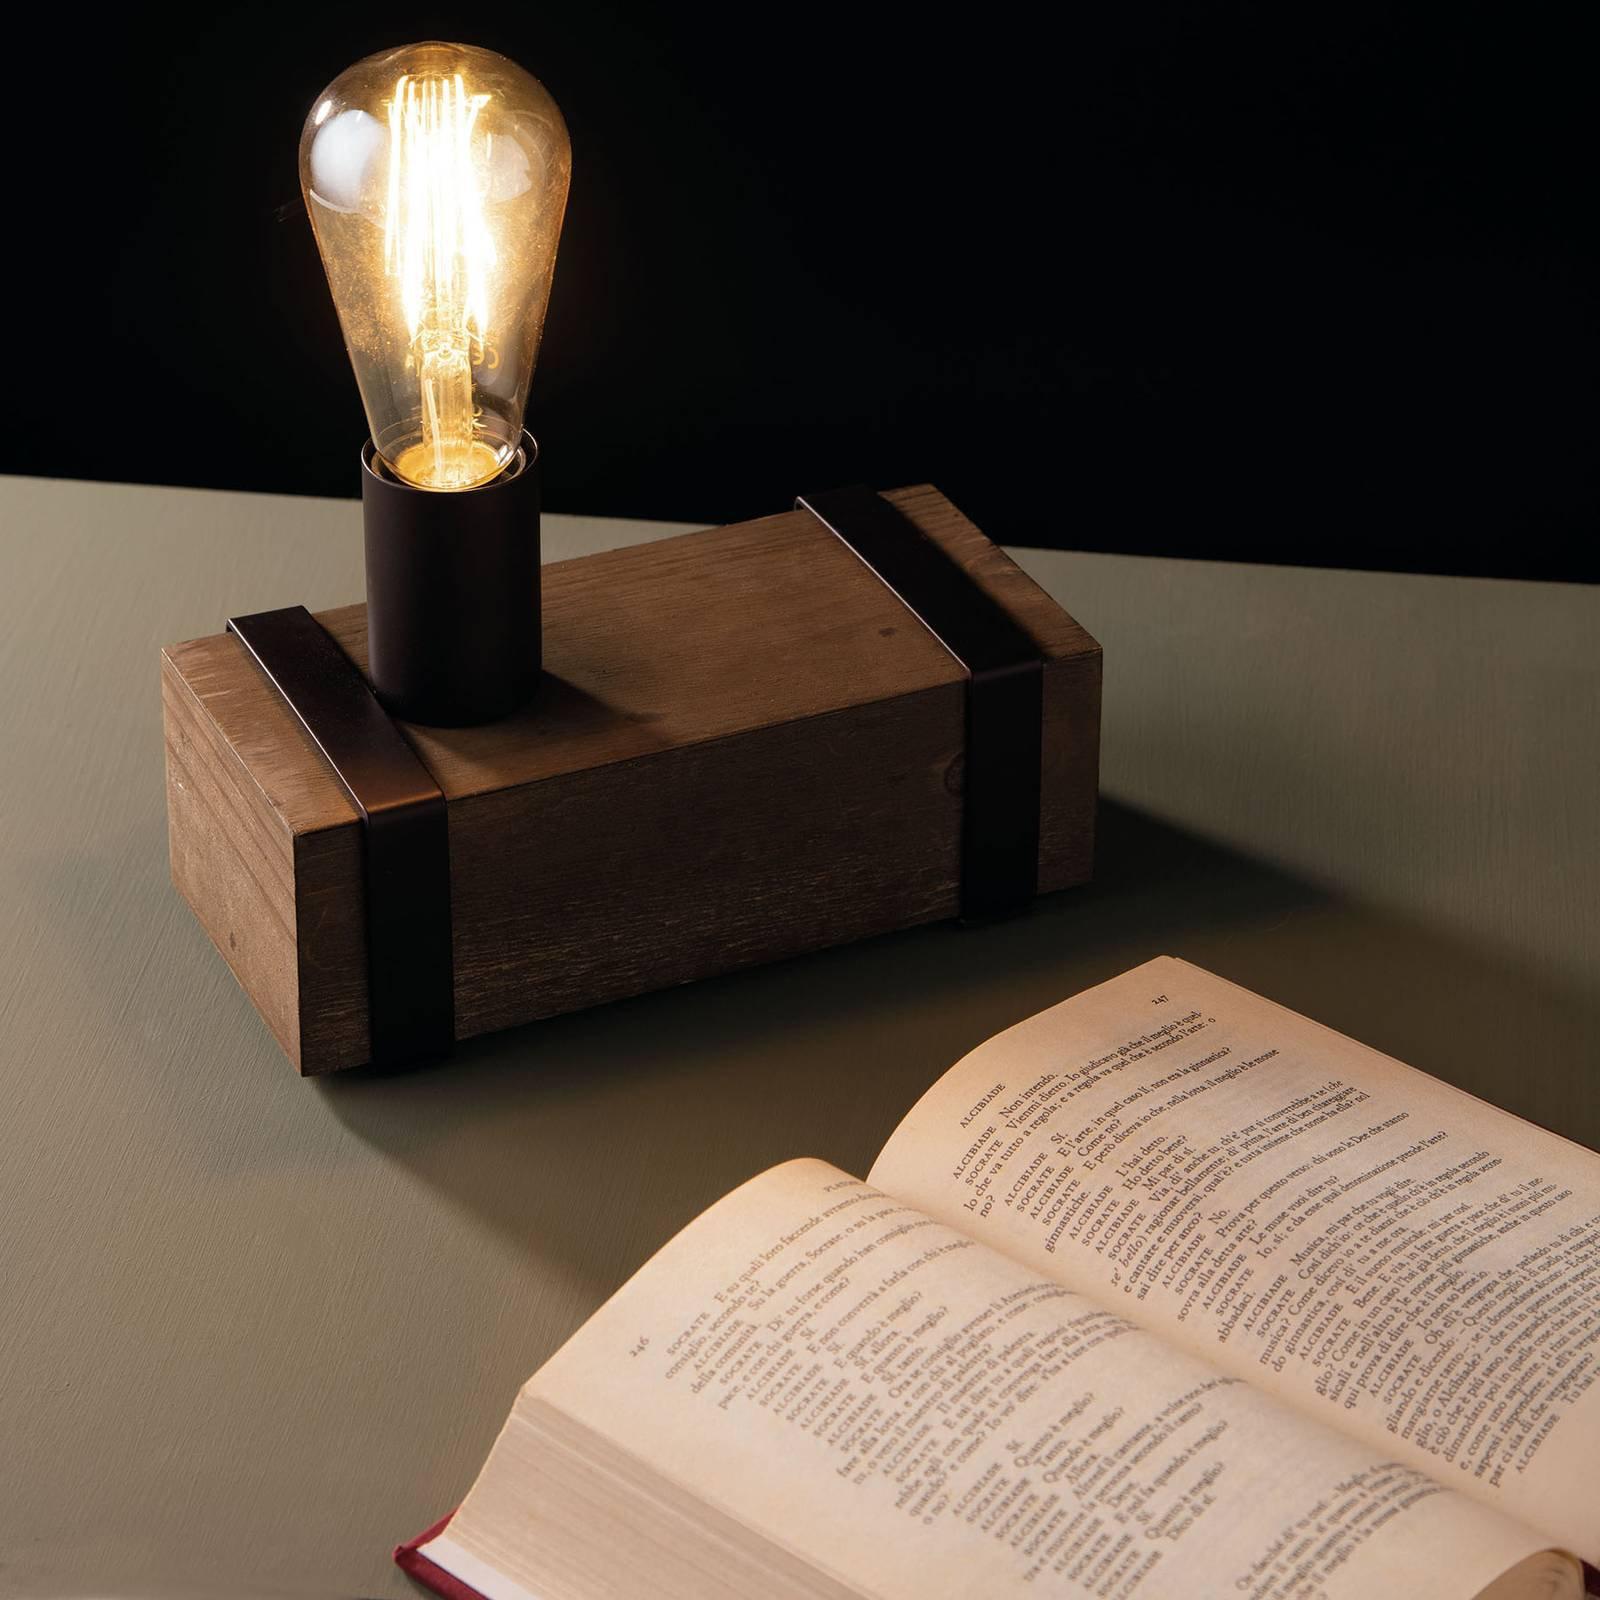 Bordlampe Texas av antikt tre, 1 lyskilde